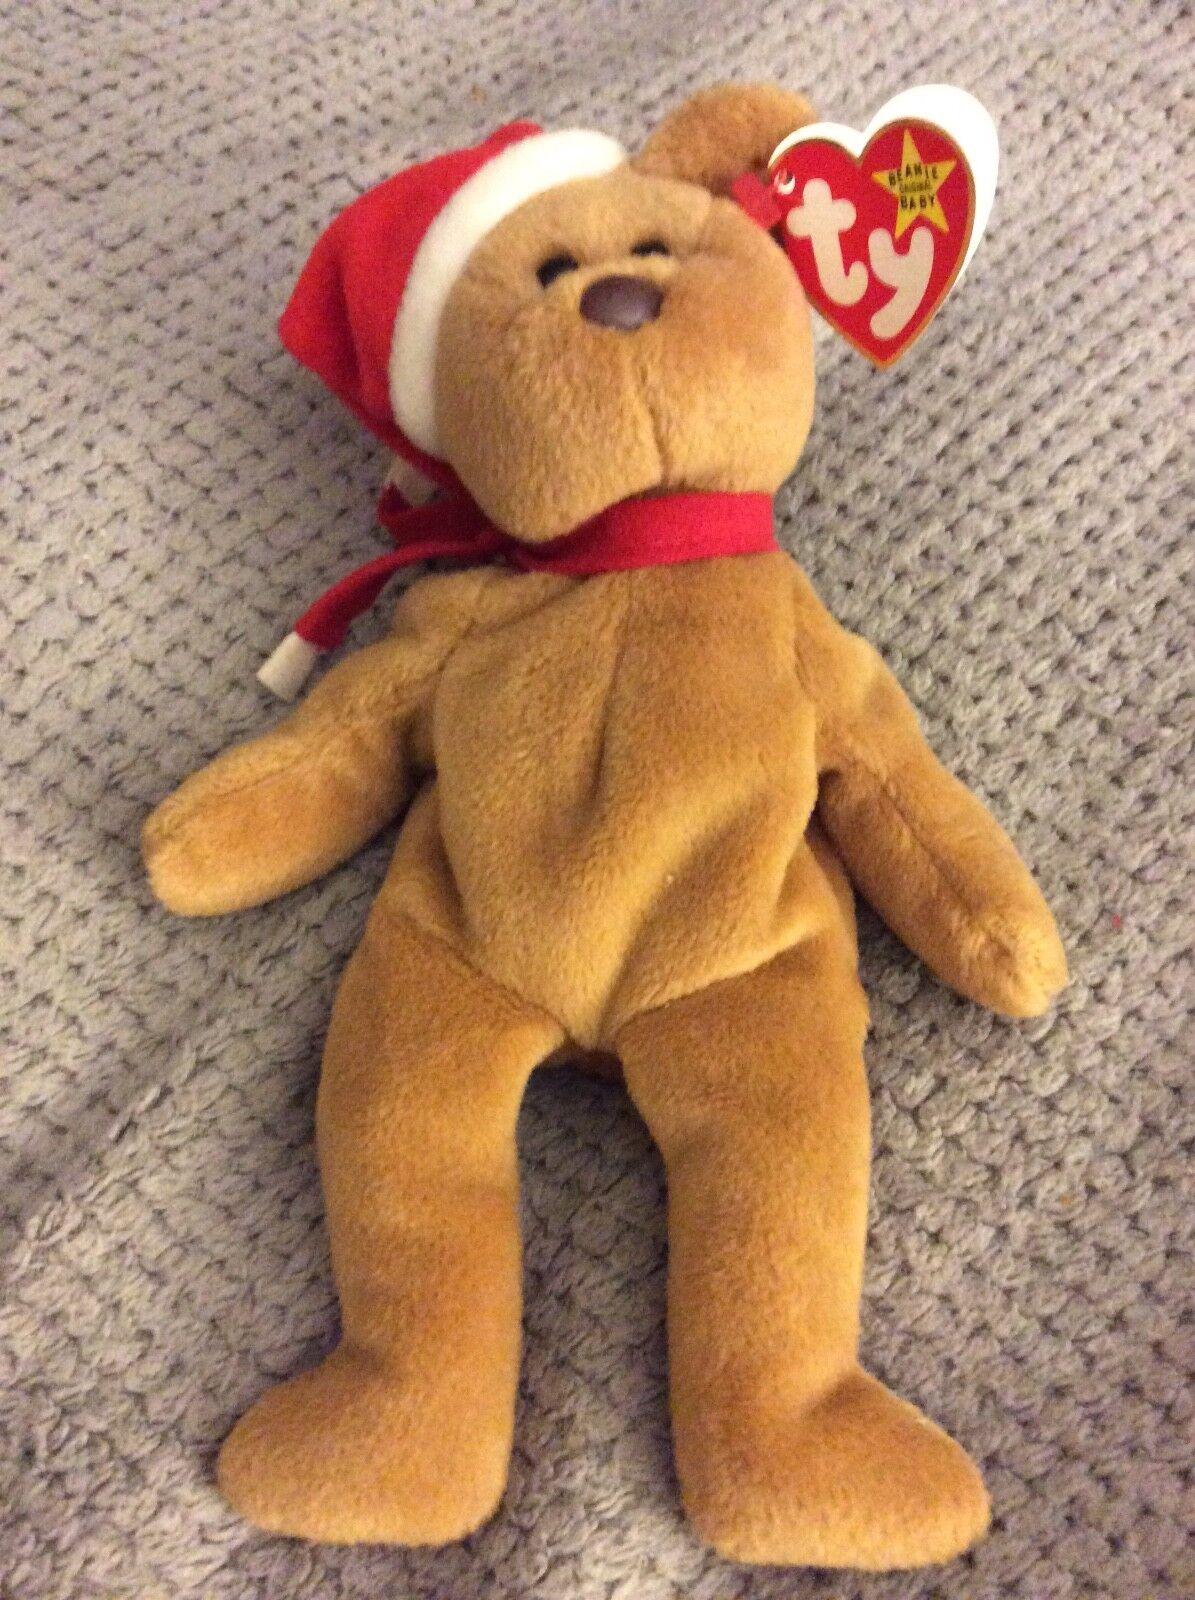 1997 Teddy Beanie Baby born 12-25-96. P.V.C. Pellets